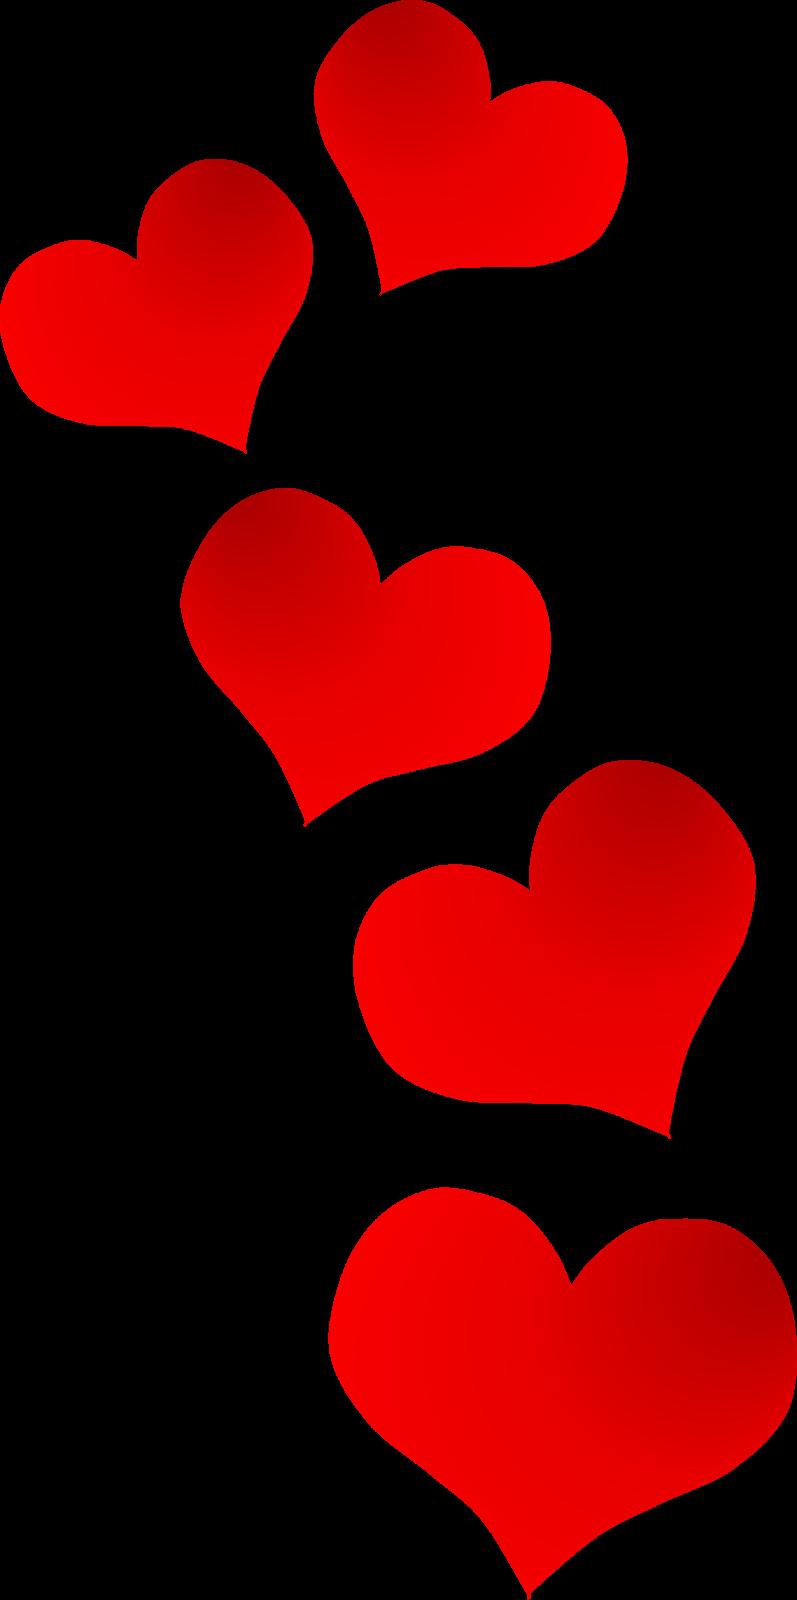 Free heart cliparts 9 clipart club